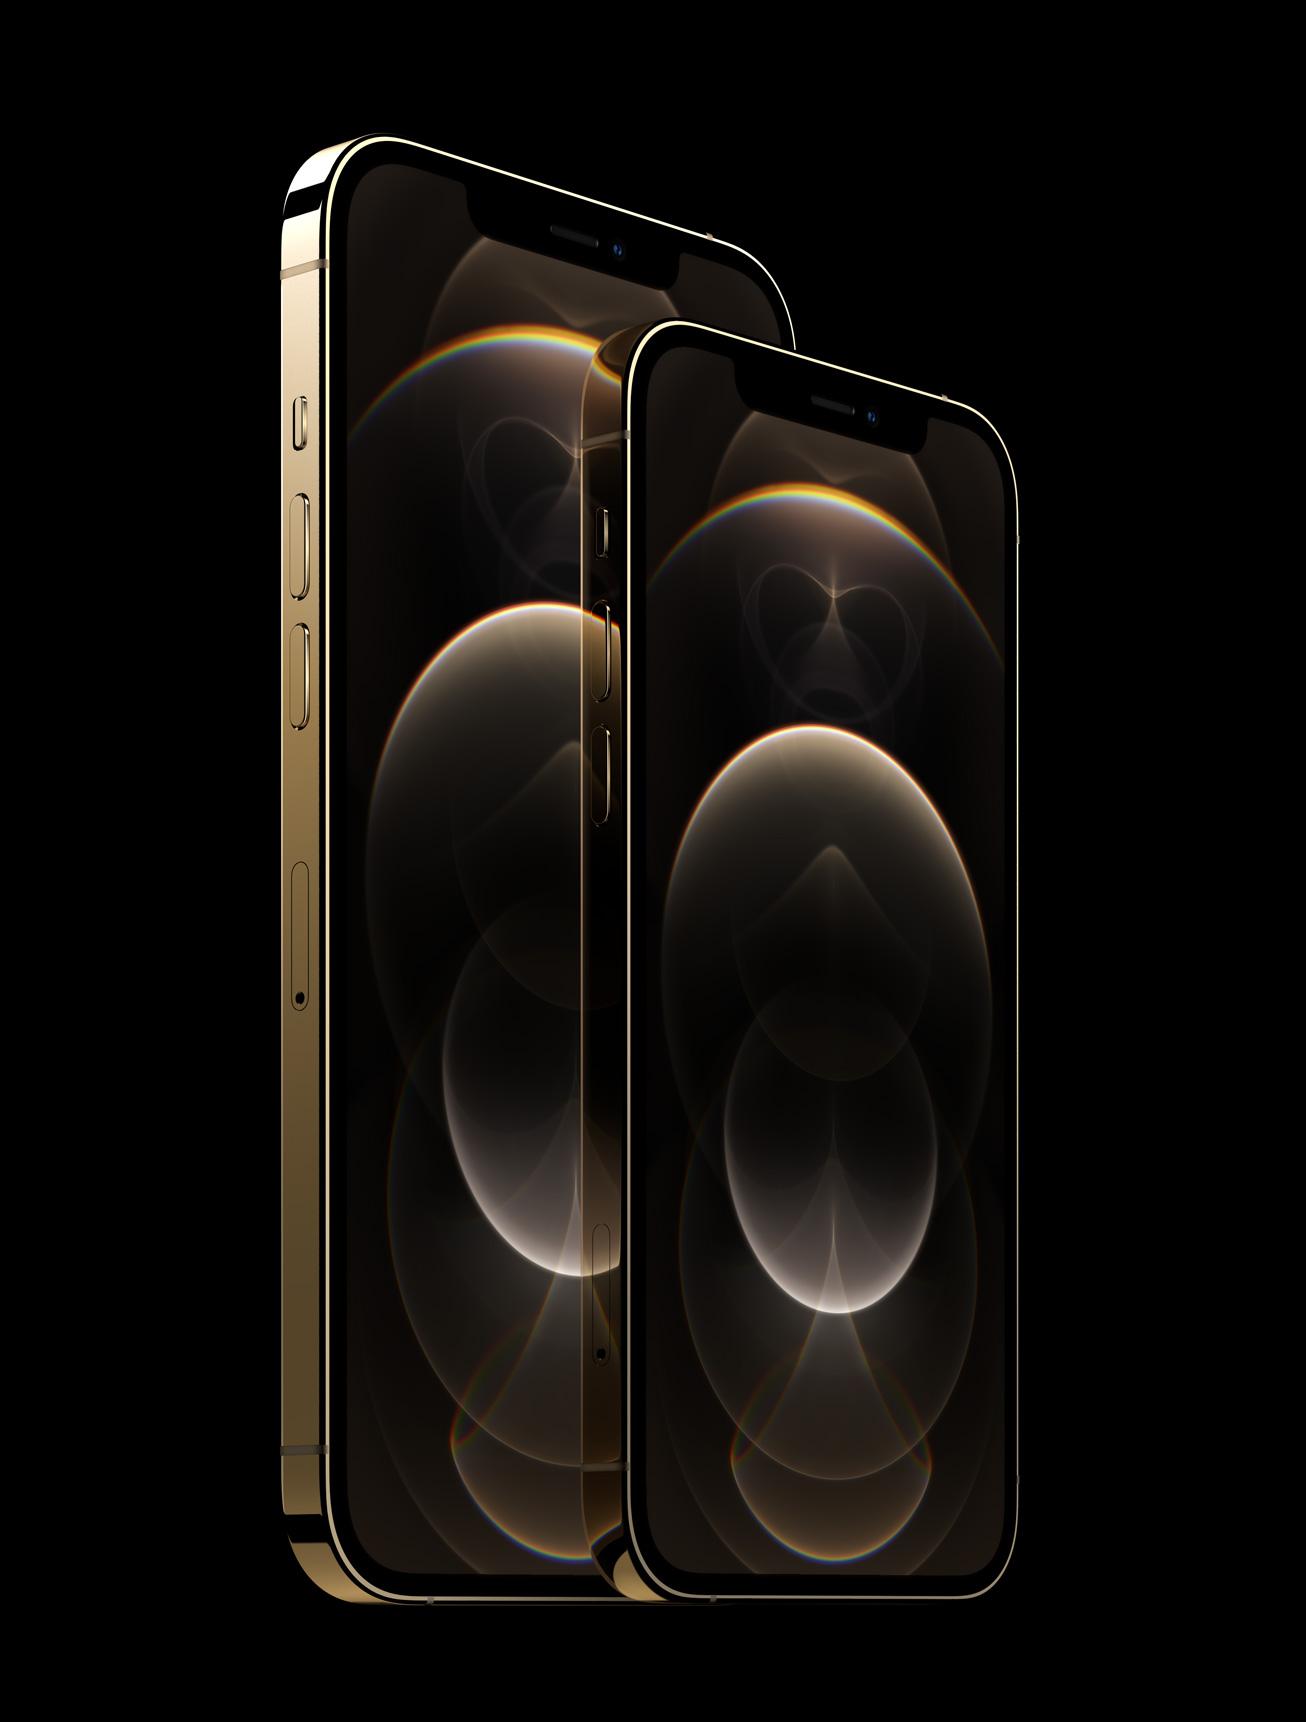 Apple_iphone12pro-stainless-steel-gold_10132020_inline.jpg.large_2x.jpg